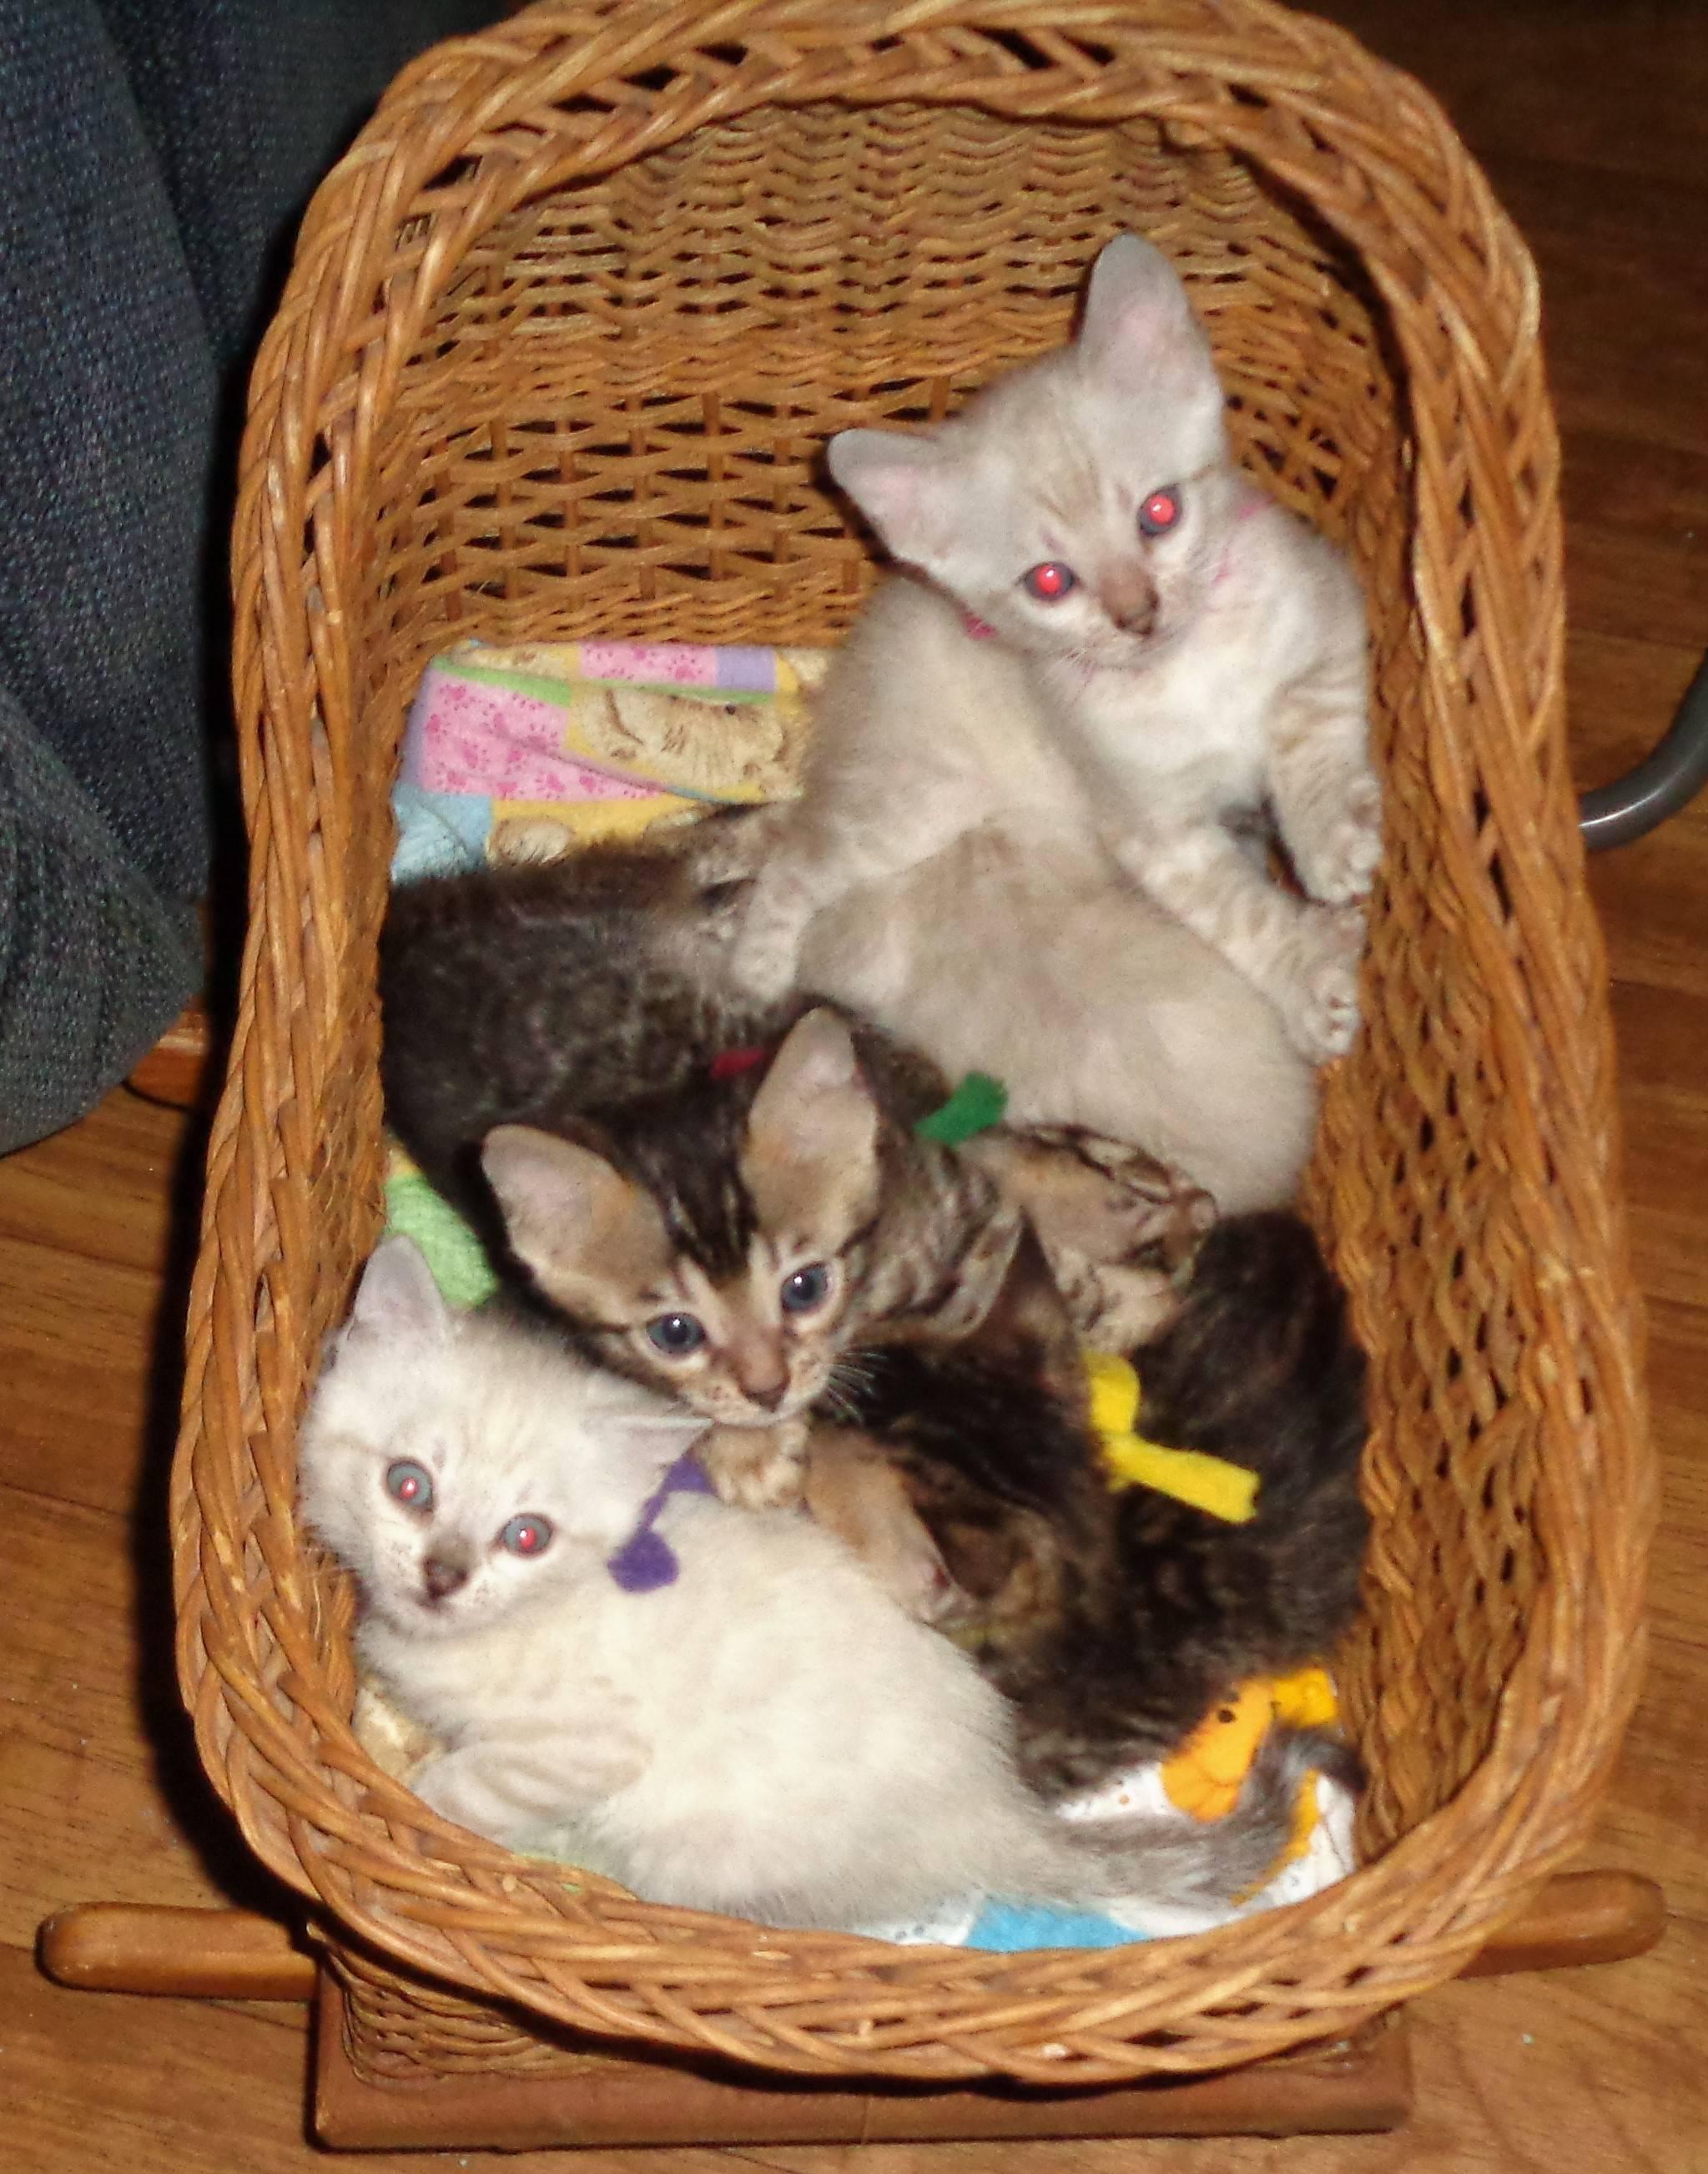 PRECIOUS KITTENS ENJOYING THEIR CRADLE...